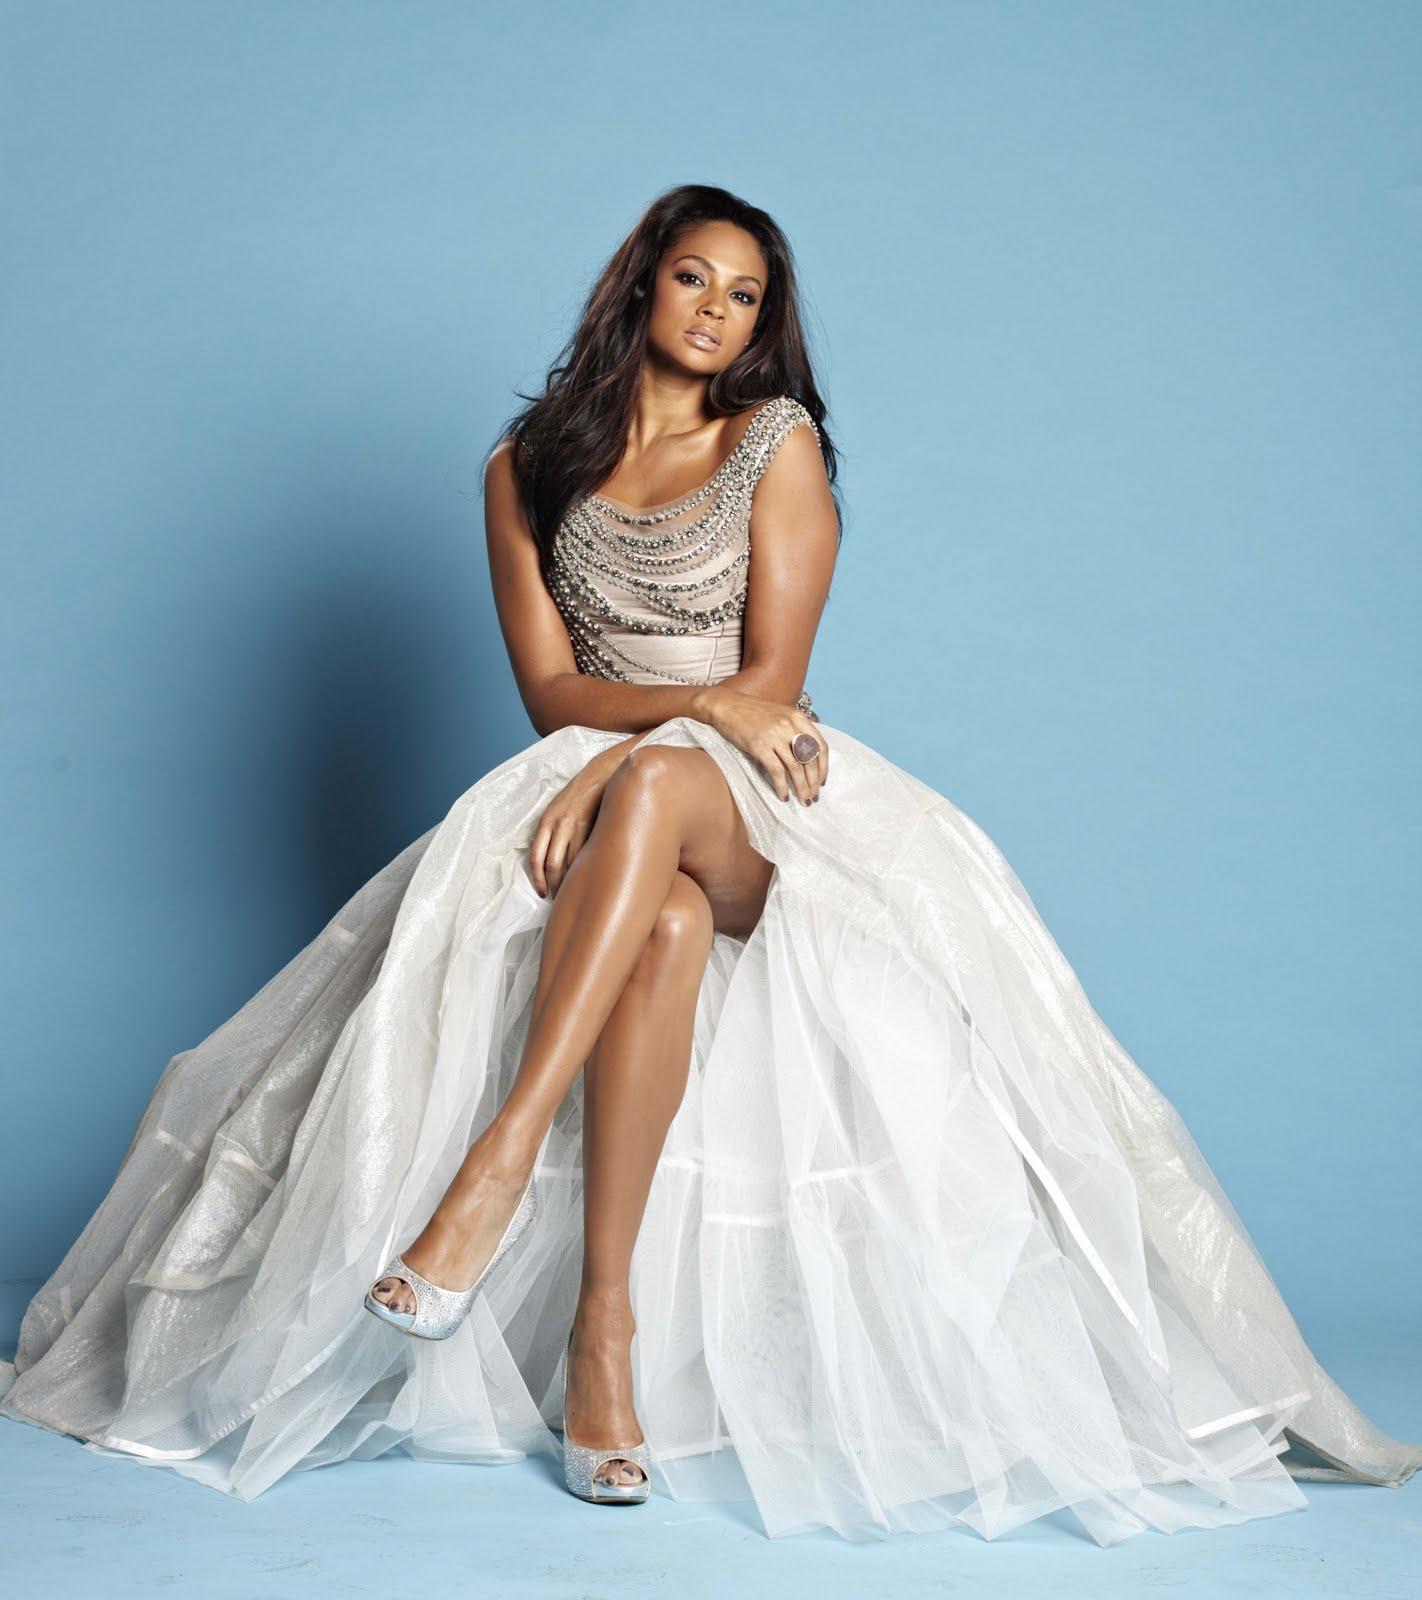 http://3.bp.blogspot.com/-Kht5k63L7W4/TnHotRaiHoI/AAAAAAAABM0/WBR_ZssMfqg/s1600/Alesha+Dixon+beautiful+business+model+%25283%2529.jpg